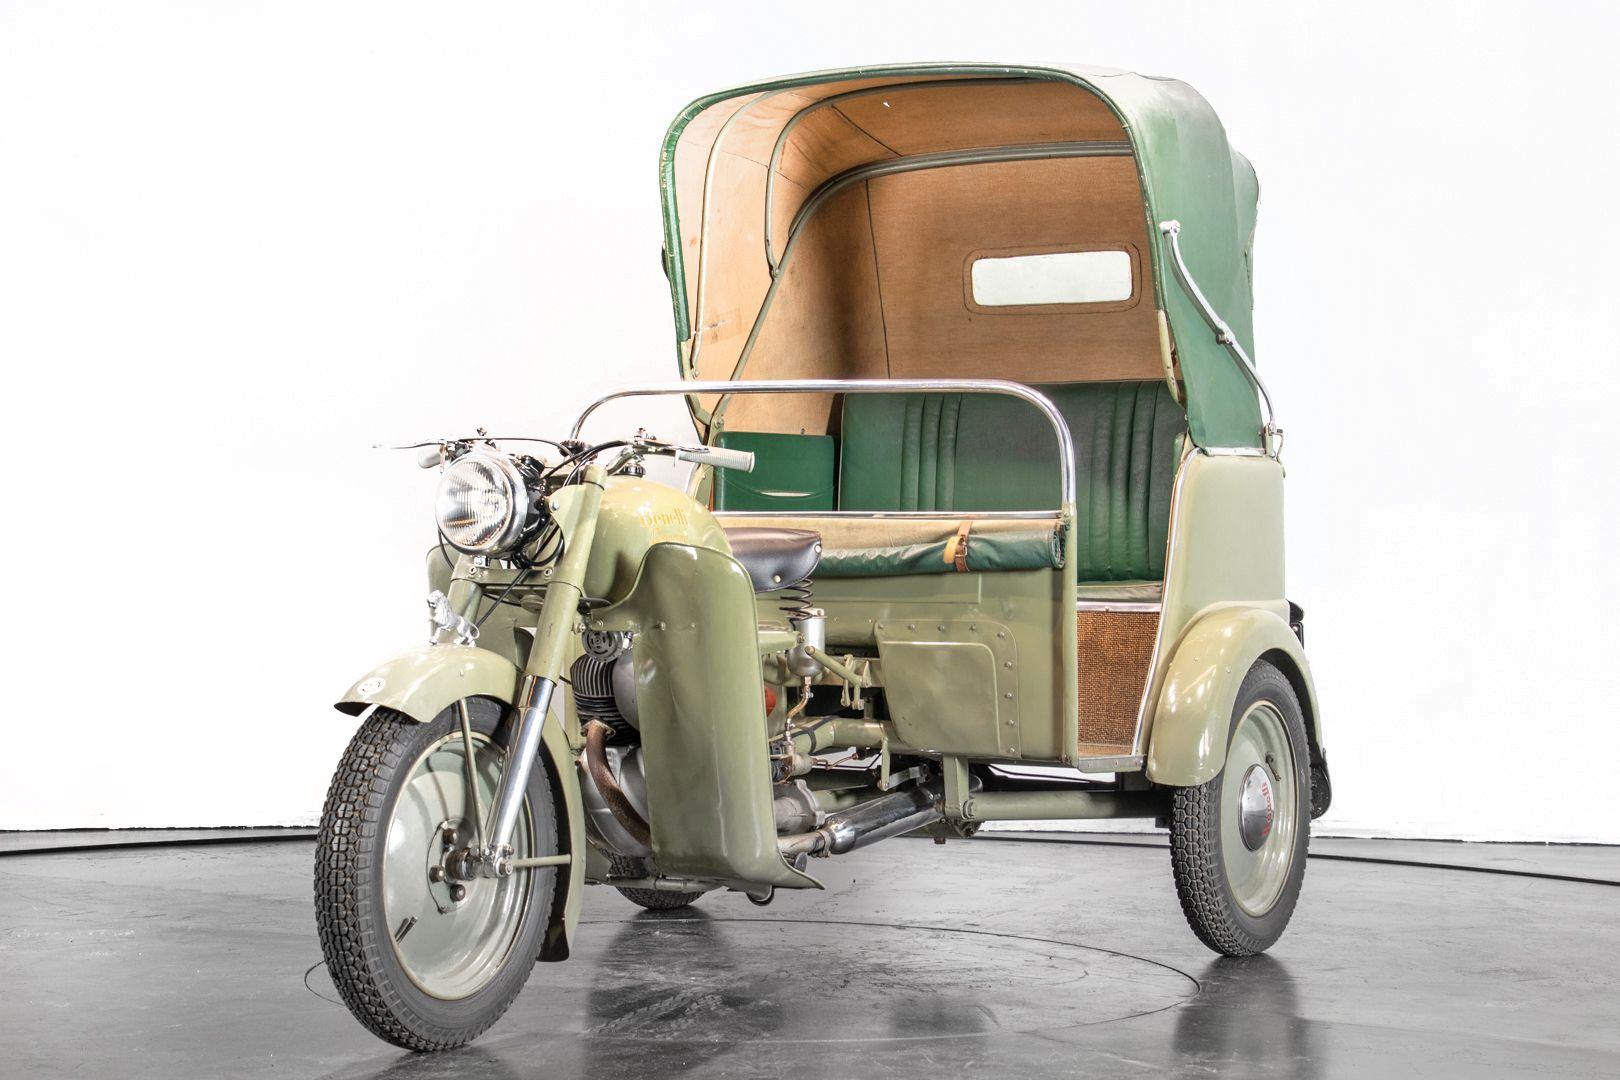 1956 Benelli 125 Leoncino Rikshaws 74323